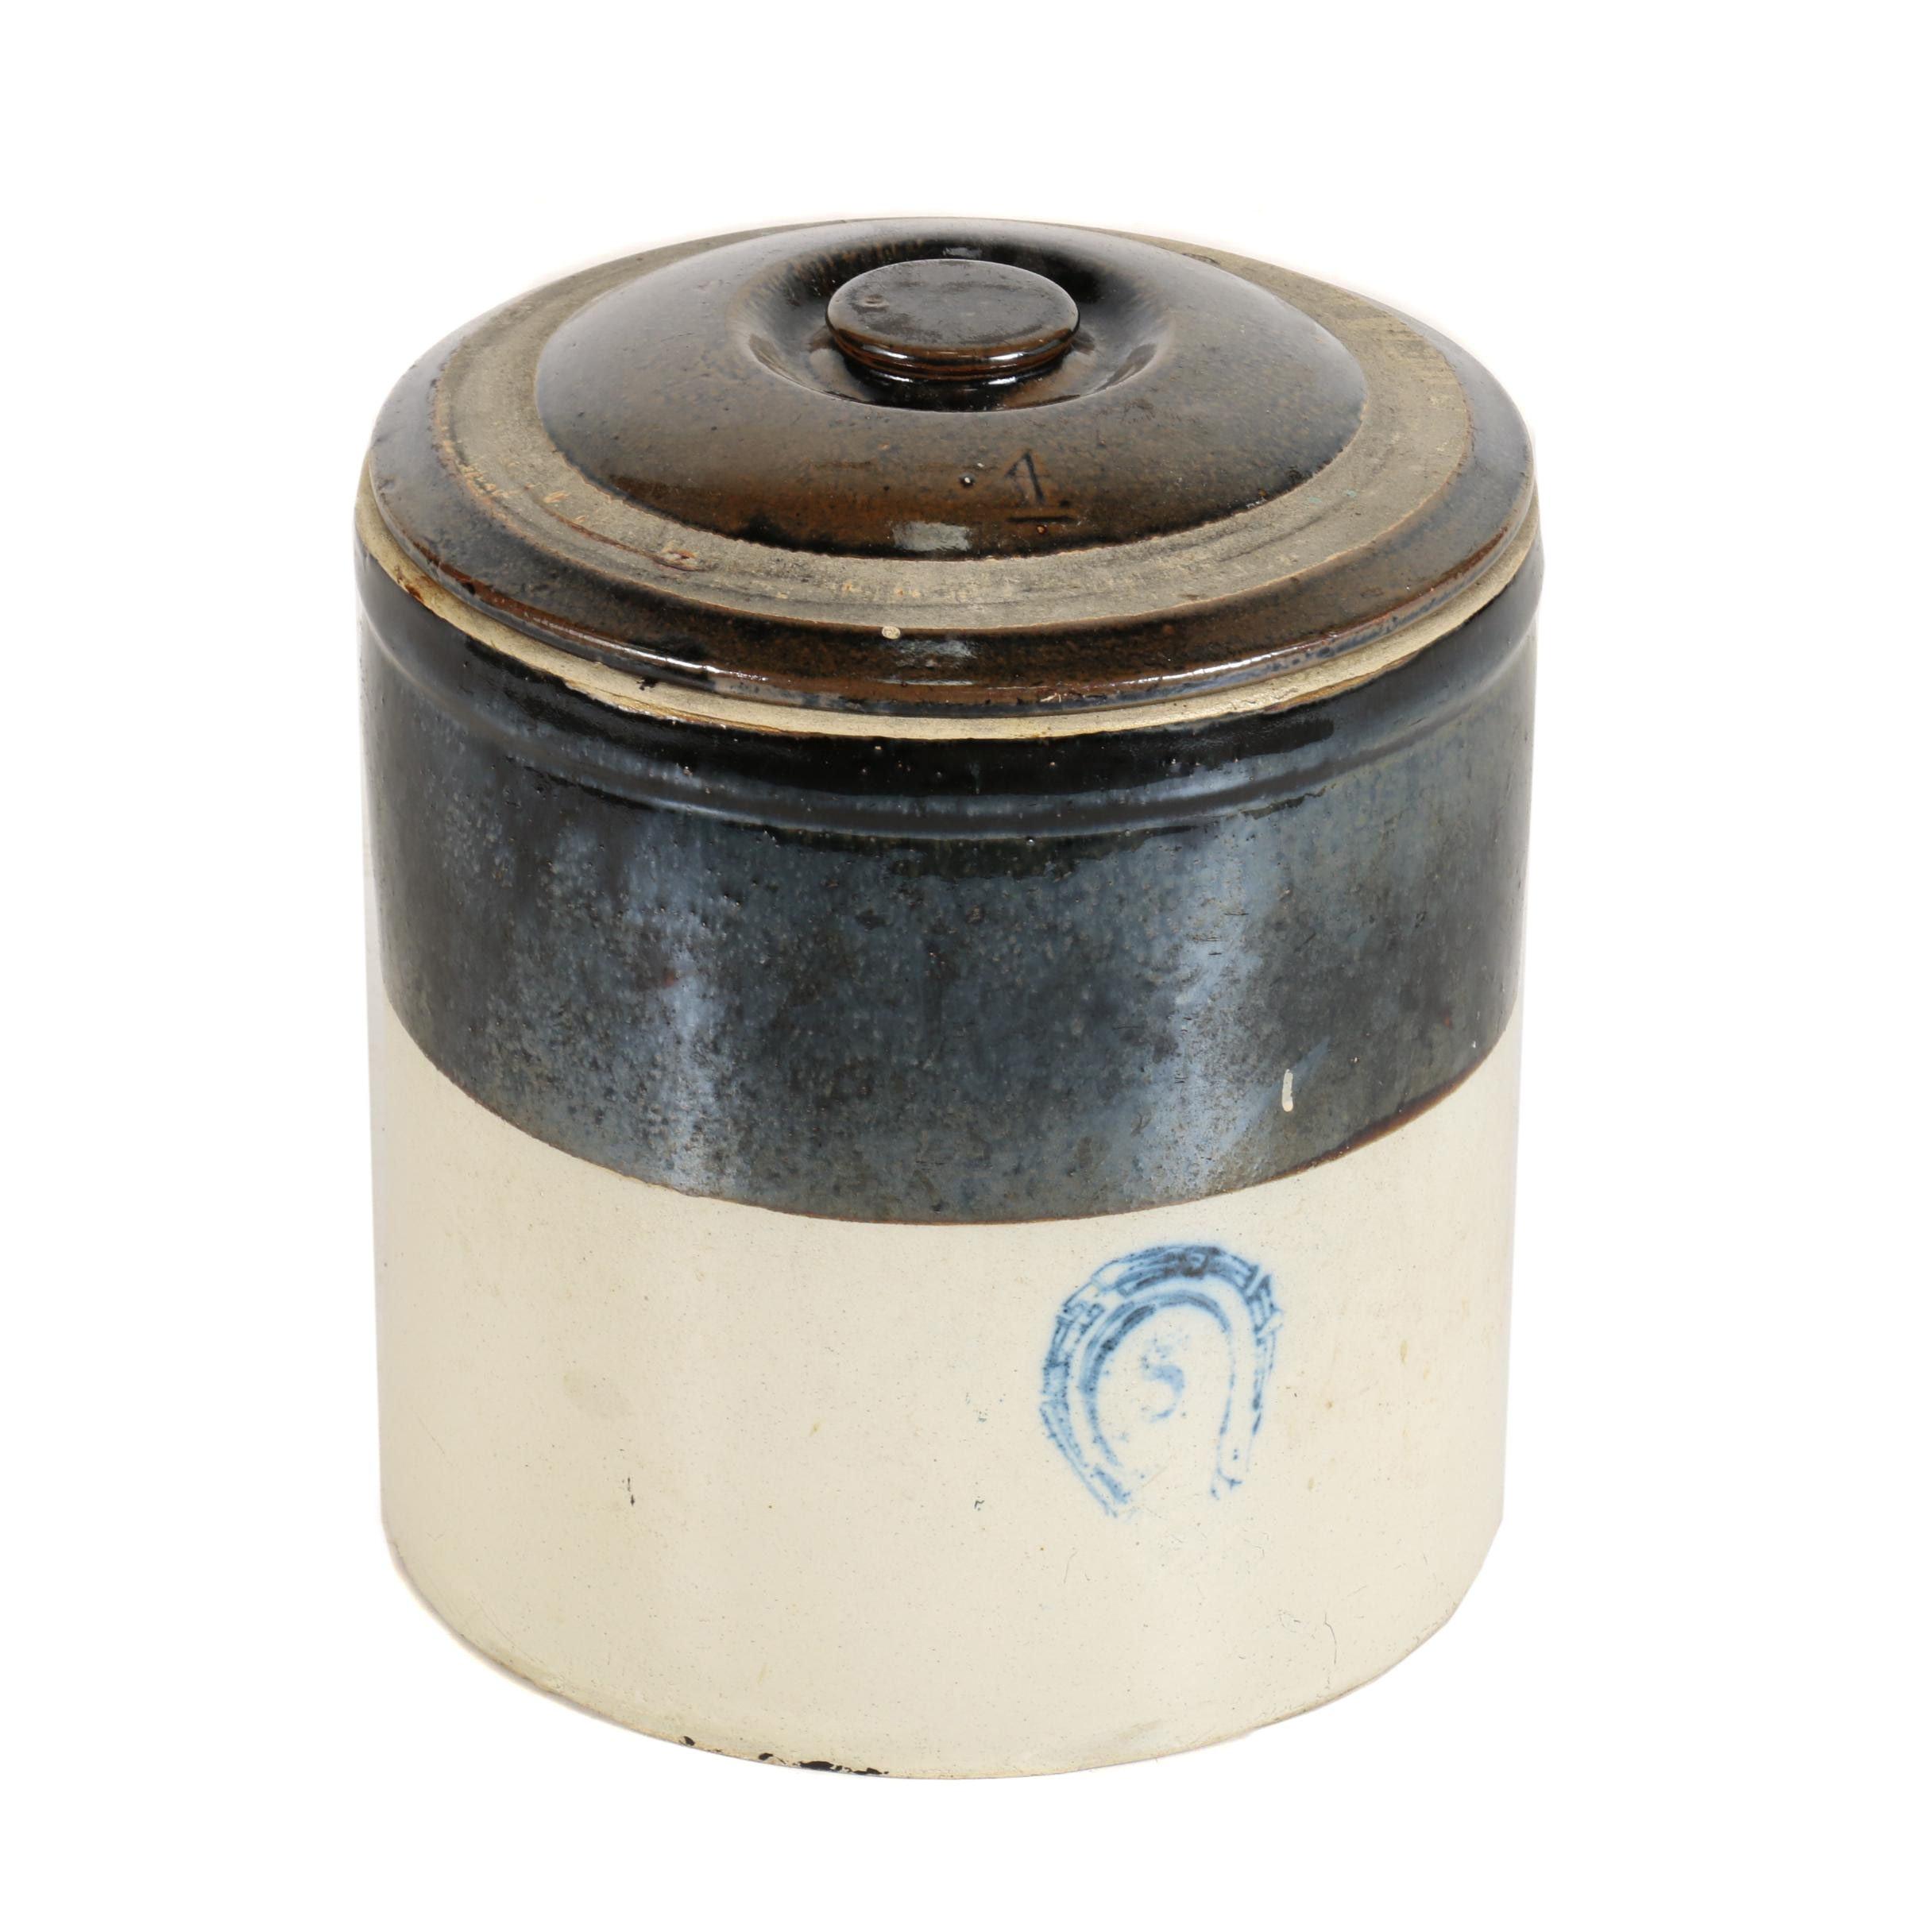 Four Gallon Lidded Stoneware Crock